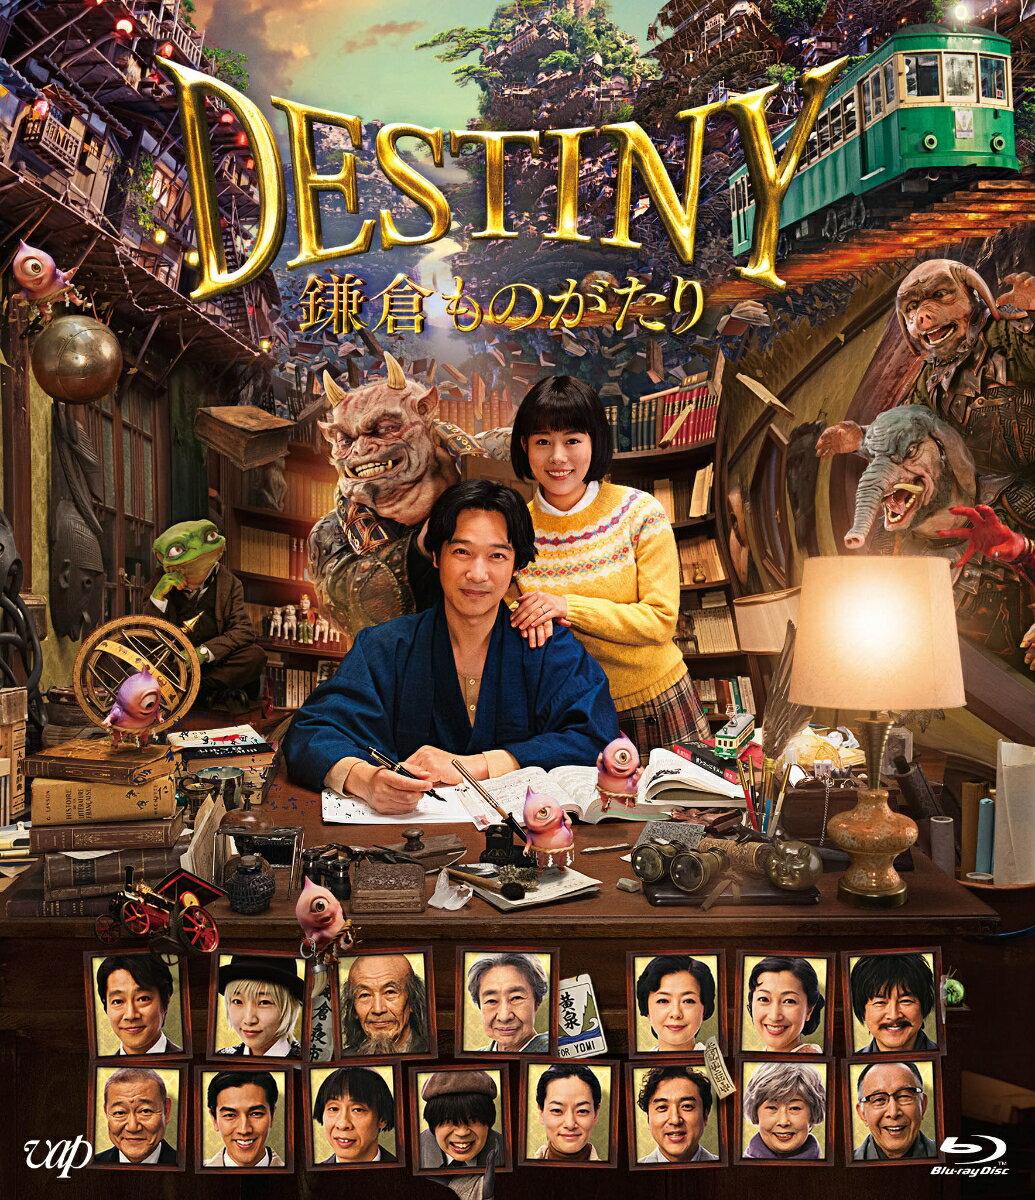 DESTINY 鎌倉ものがたり 豪華版【Blu-ray】 [ 堺雅人 ]